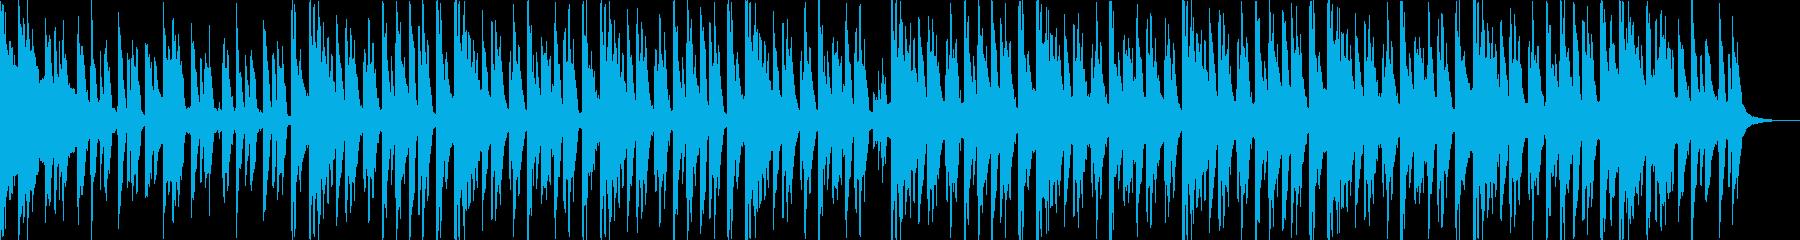 EDMドロップオンリー 04の再生済みの波形